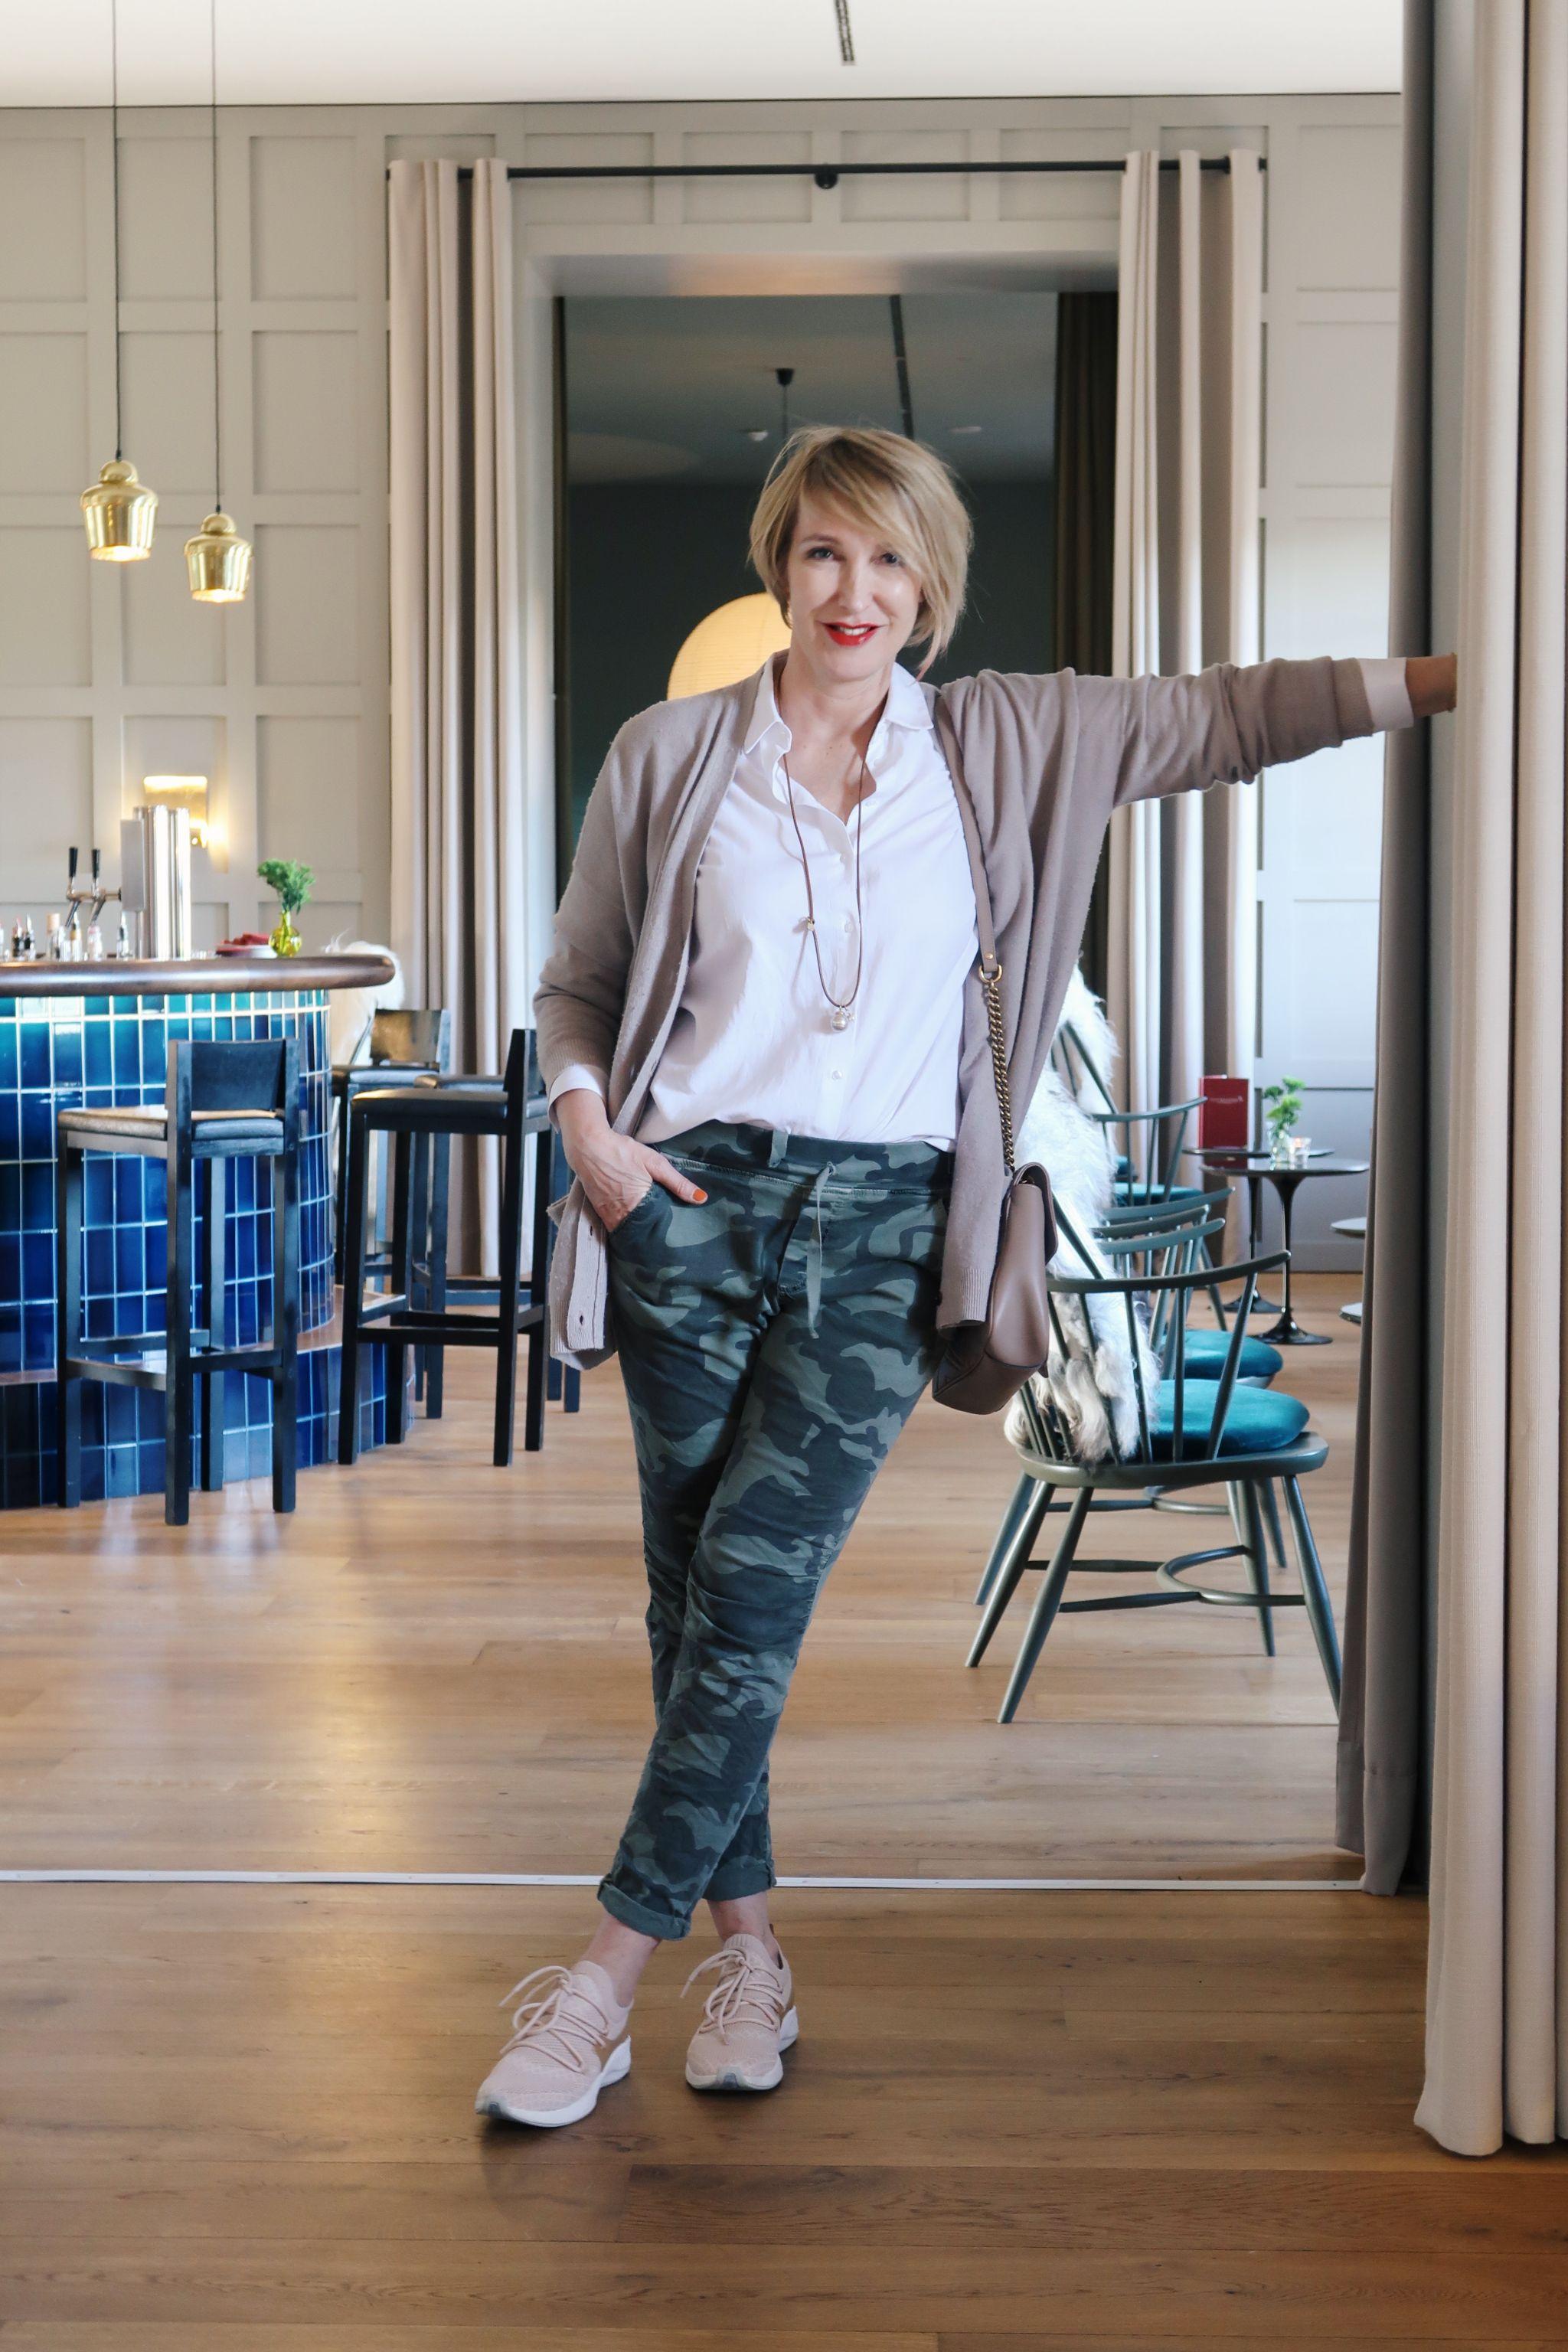 glamupyourlifestyle klassische-weiße-bluse camouflage-muster camouflage neyo-fashion timberland-sneakers ue40-blog